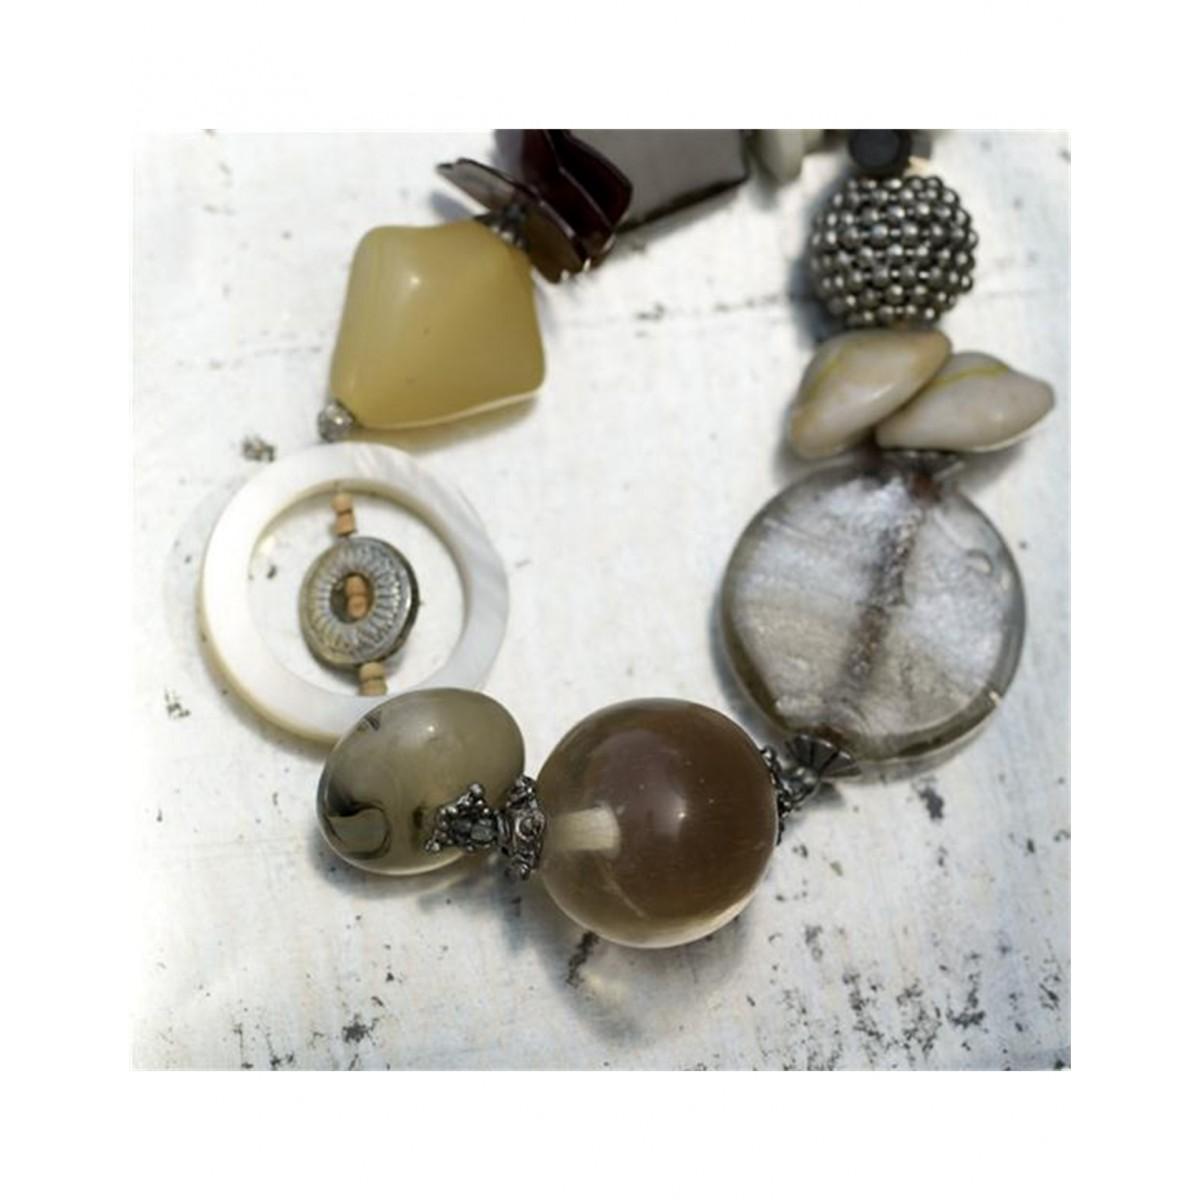 Fair Trade Ladies Jewellery Pressies 4 Princesses